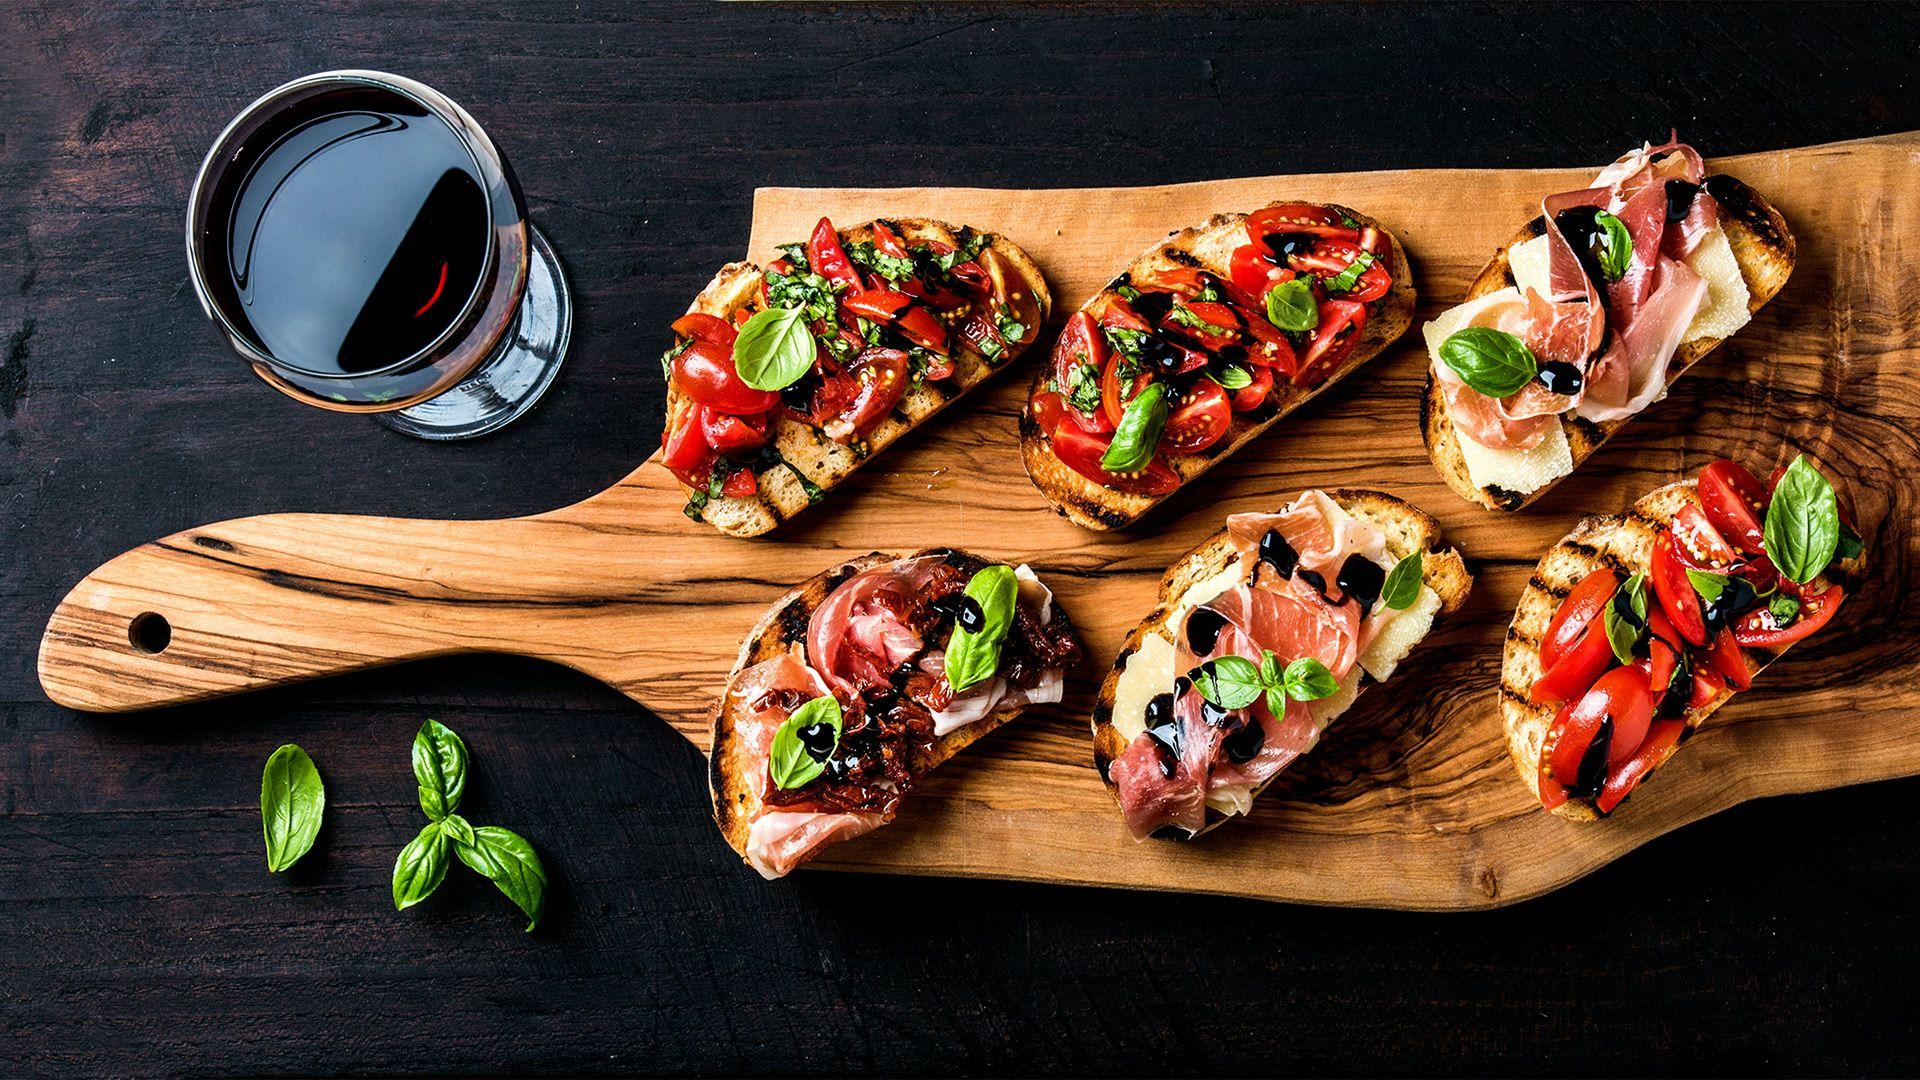 produtos-gourmet-delicatessen-espanha-gourmet-experience-8.jpg